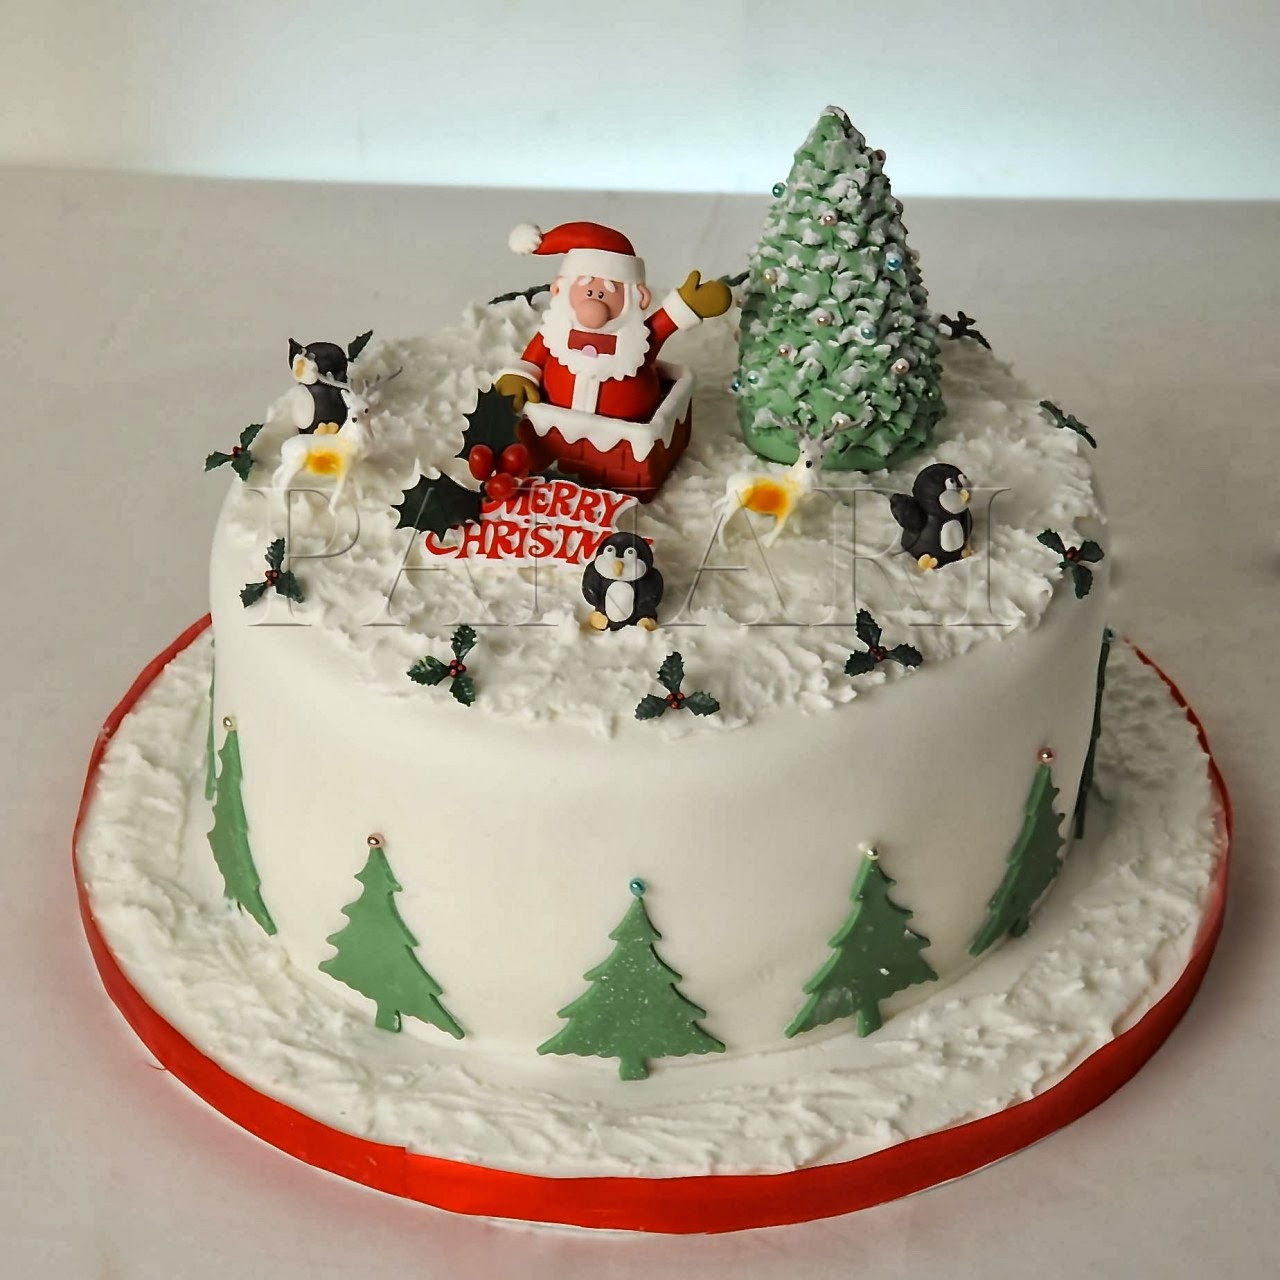 Cakes For Christmas  Merry Christmas Cake HD Wallpapers Blog